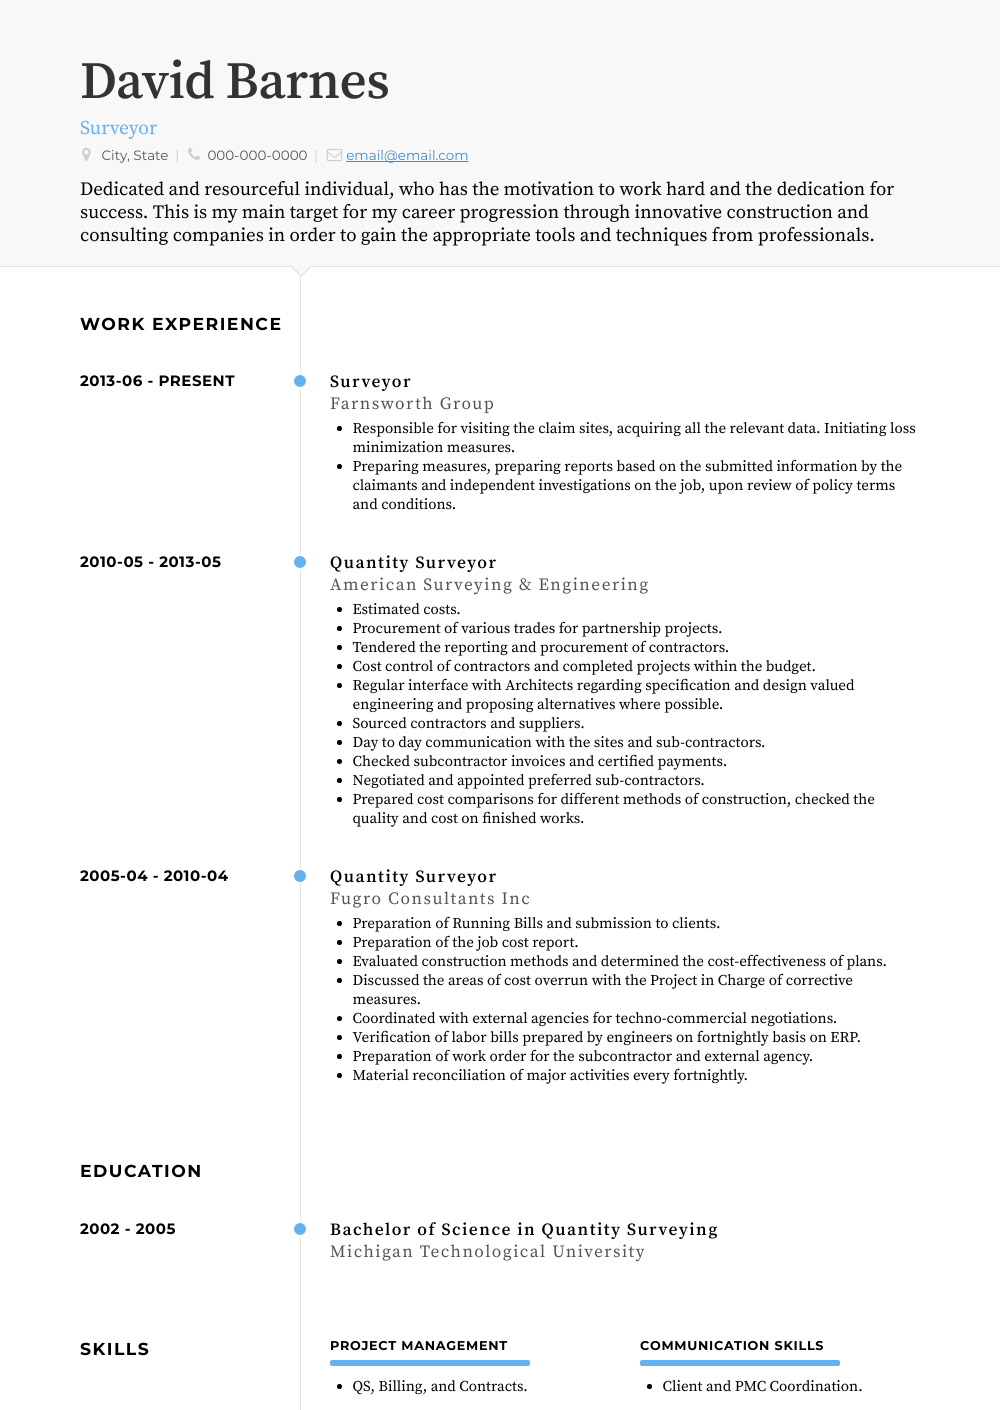 Surveyor Resume Sample and Template